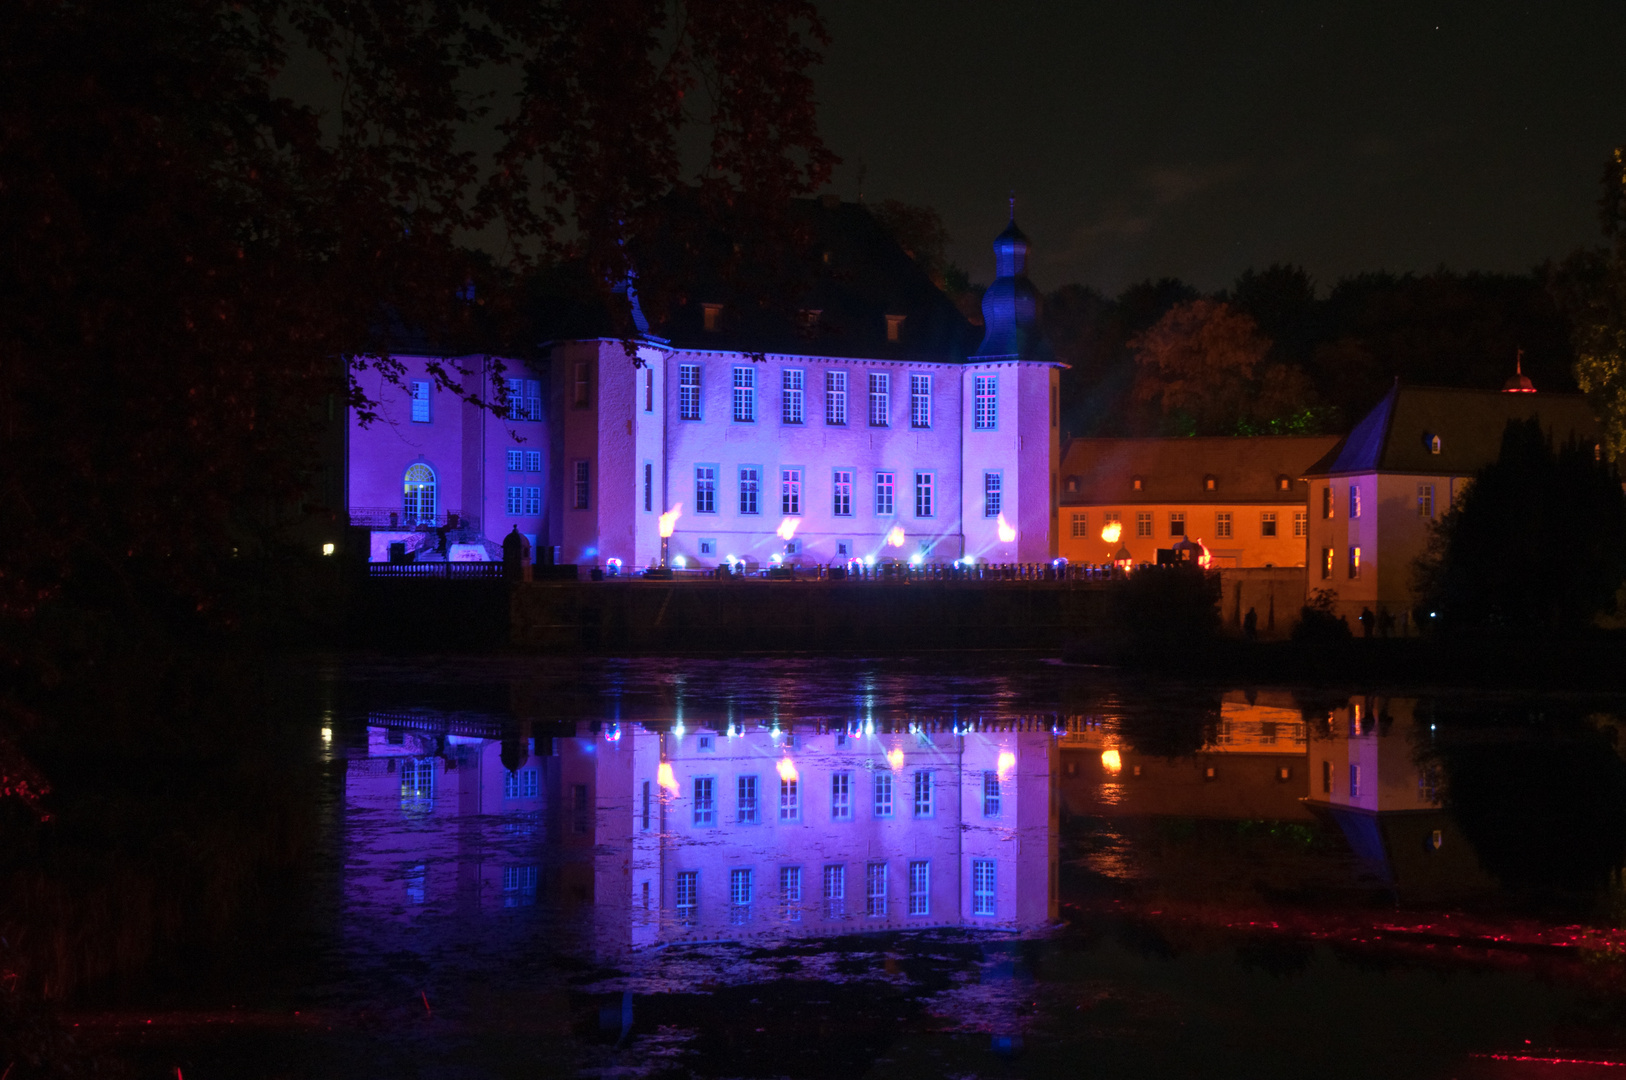 Illumina Schloss Dyck